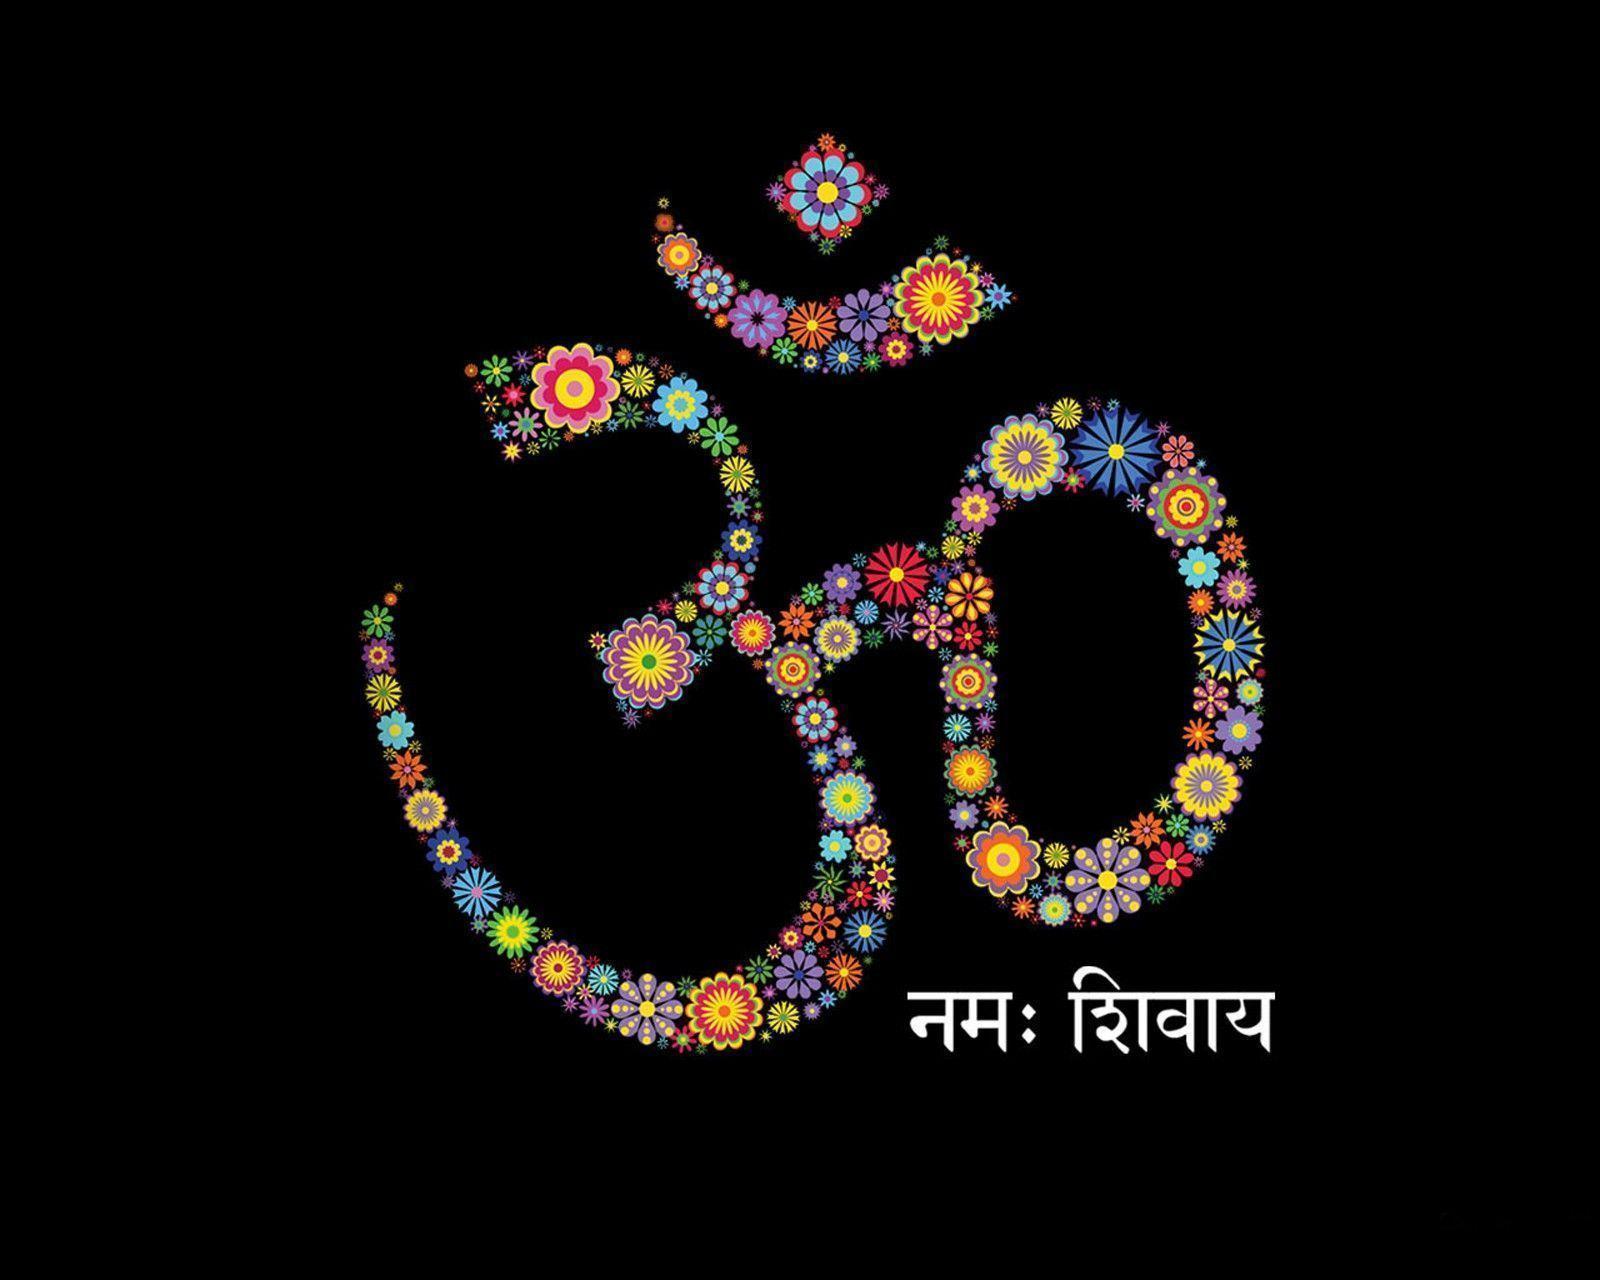 Hinduism Symbol Om Desktop Wallpapers HD Photos Free